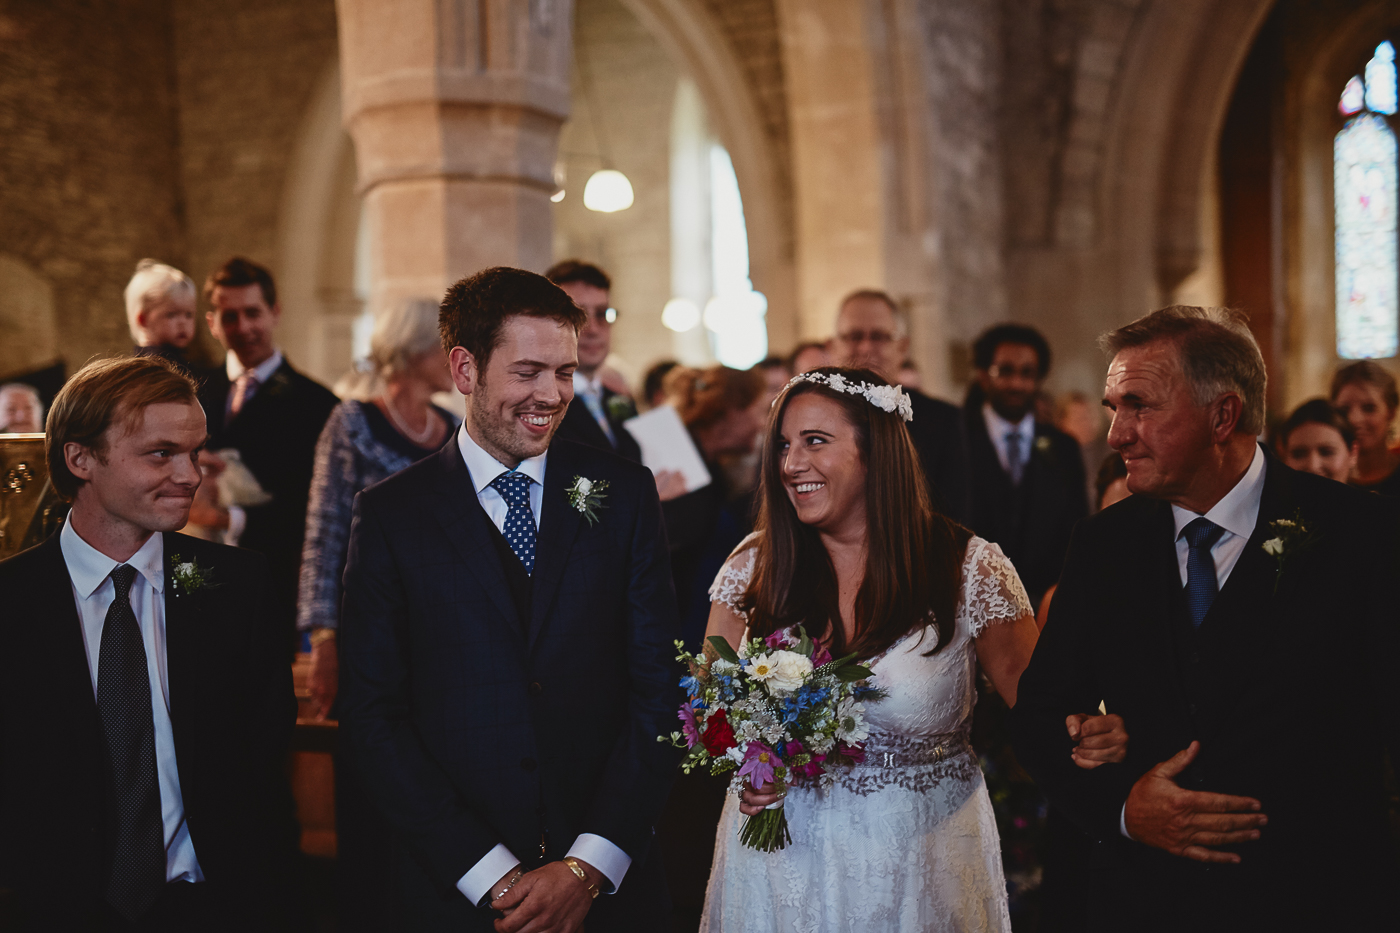 Danni_And_Jack_Gloucester_Wedding-67.jpg